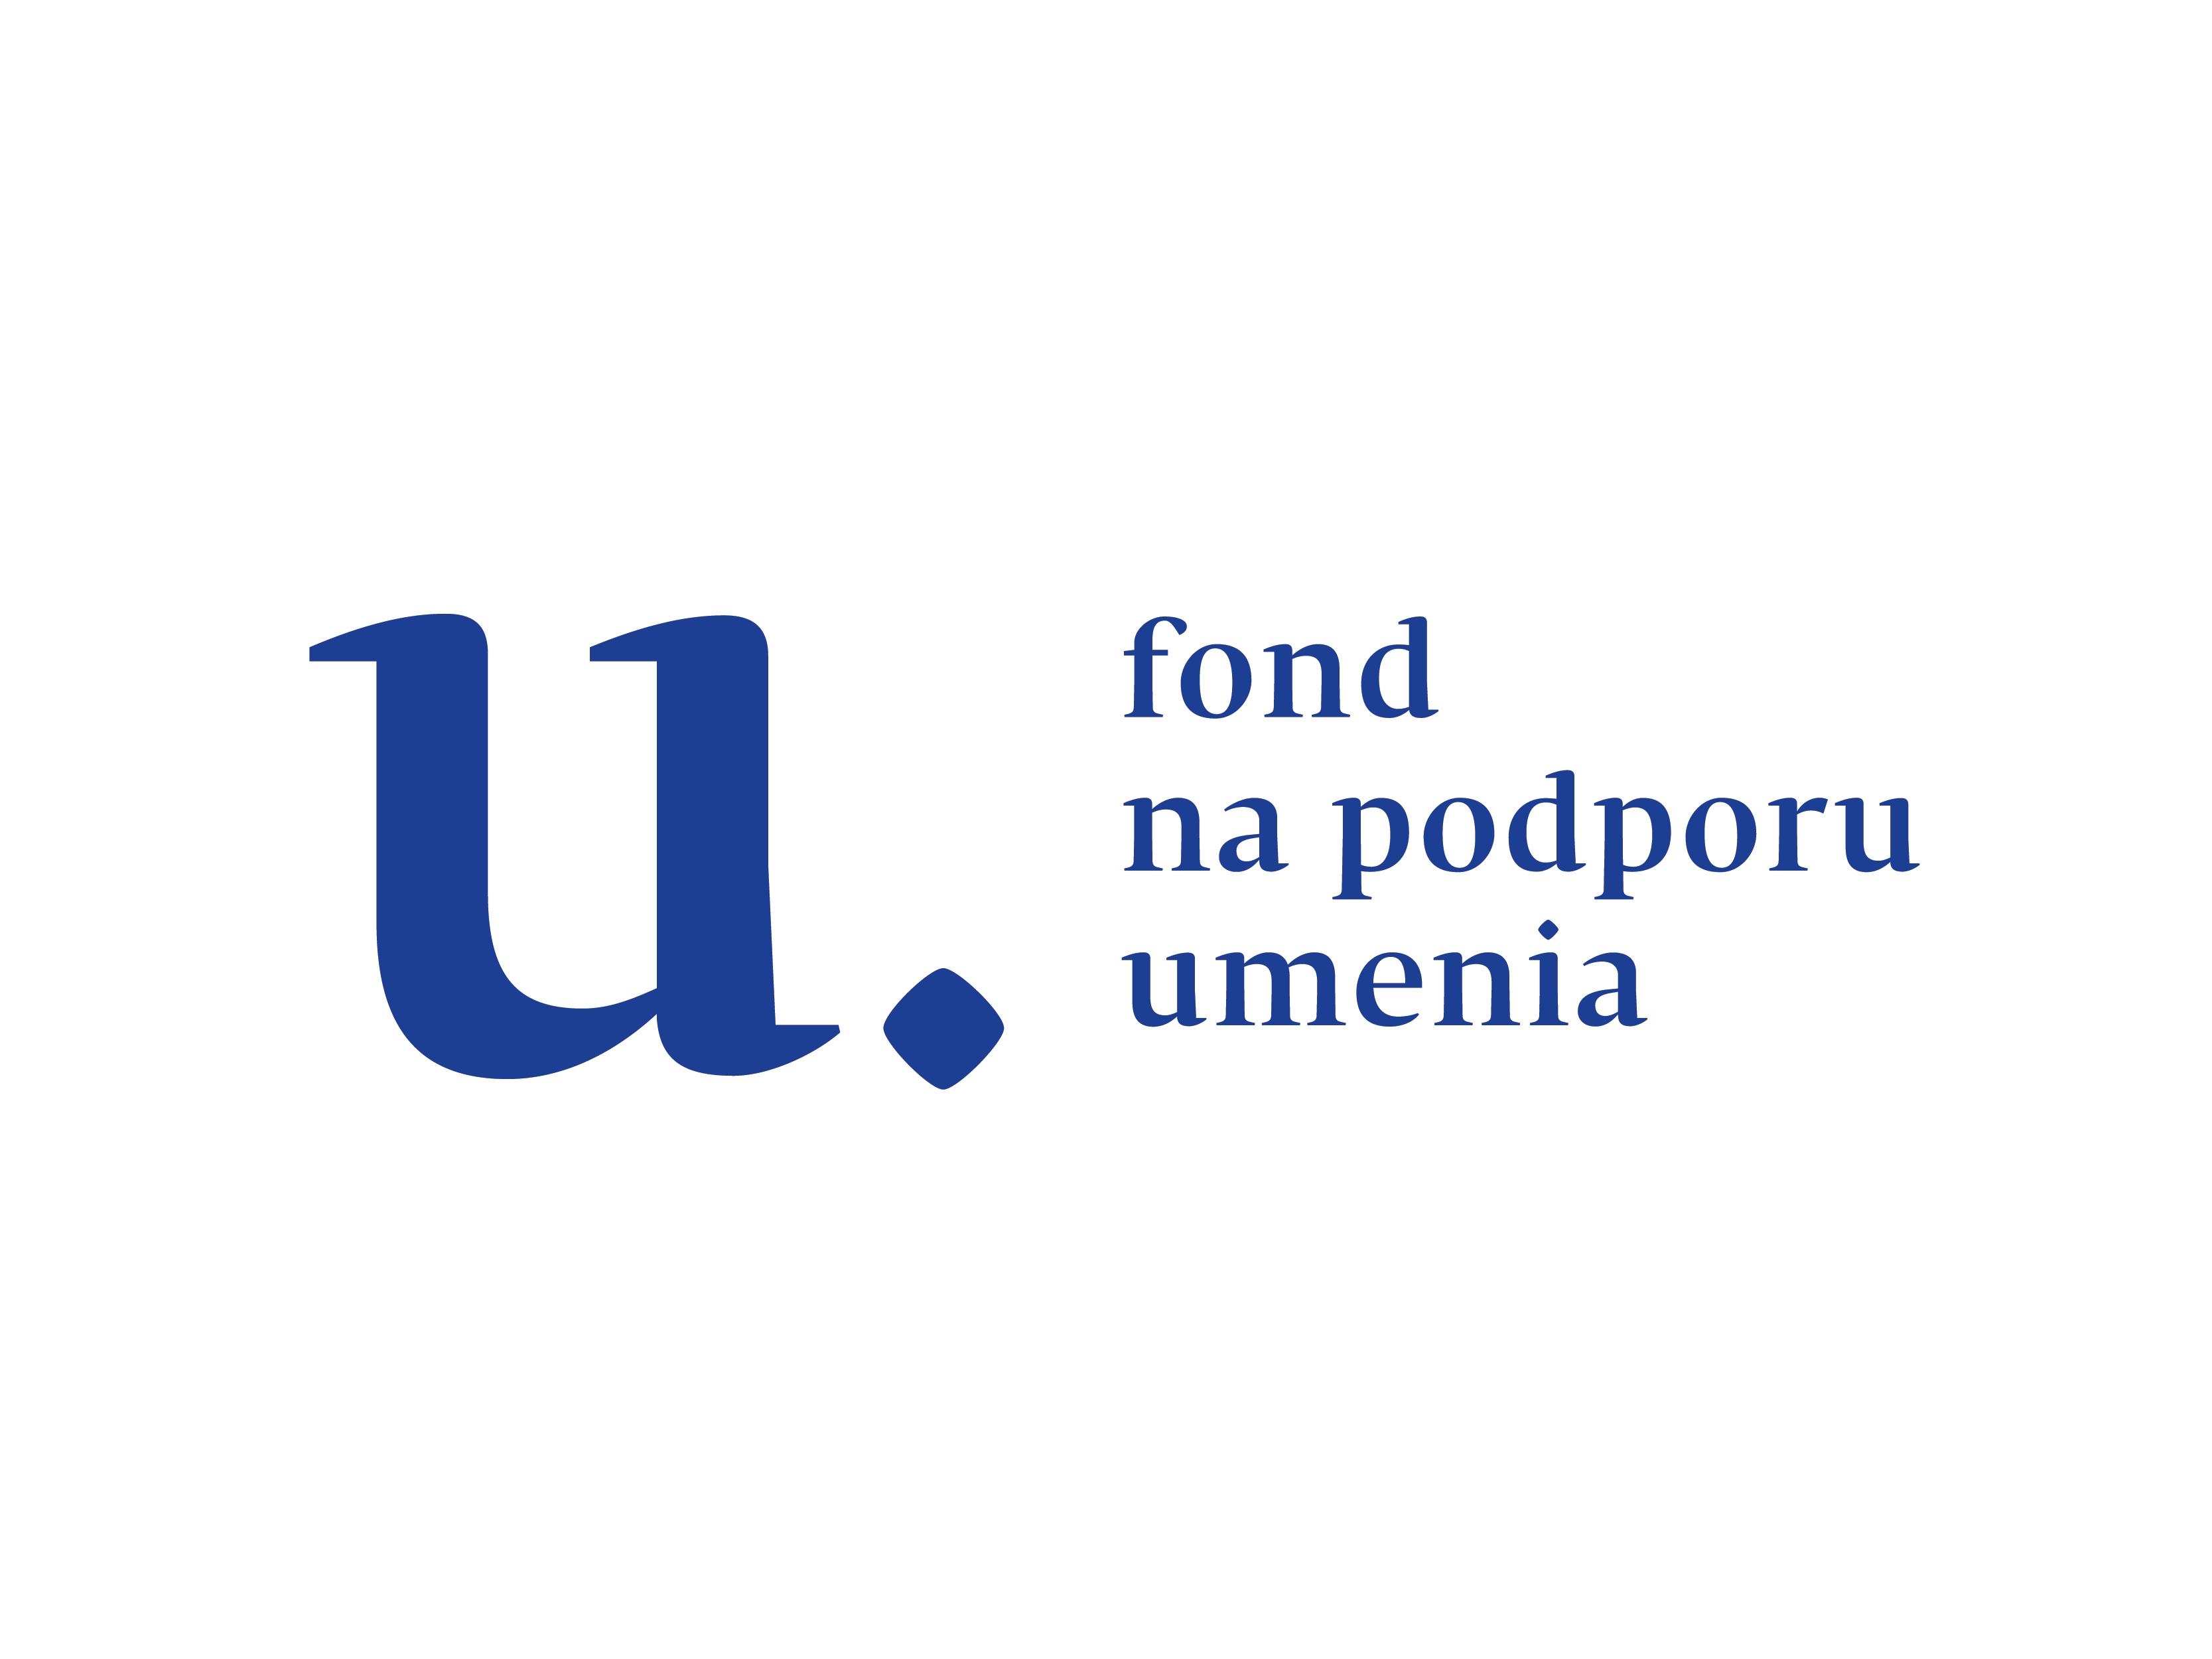 http://www.kniznicapetrzalka.sk/wp-content/uploads/2018/03/FPU_logo1_modre.jpg